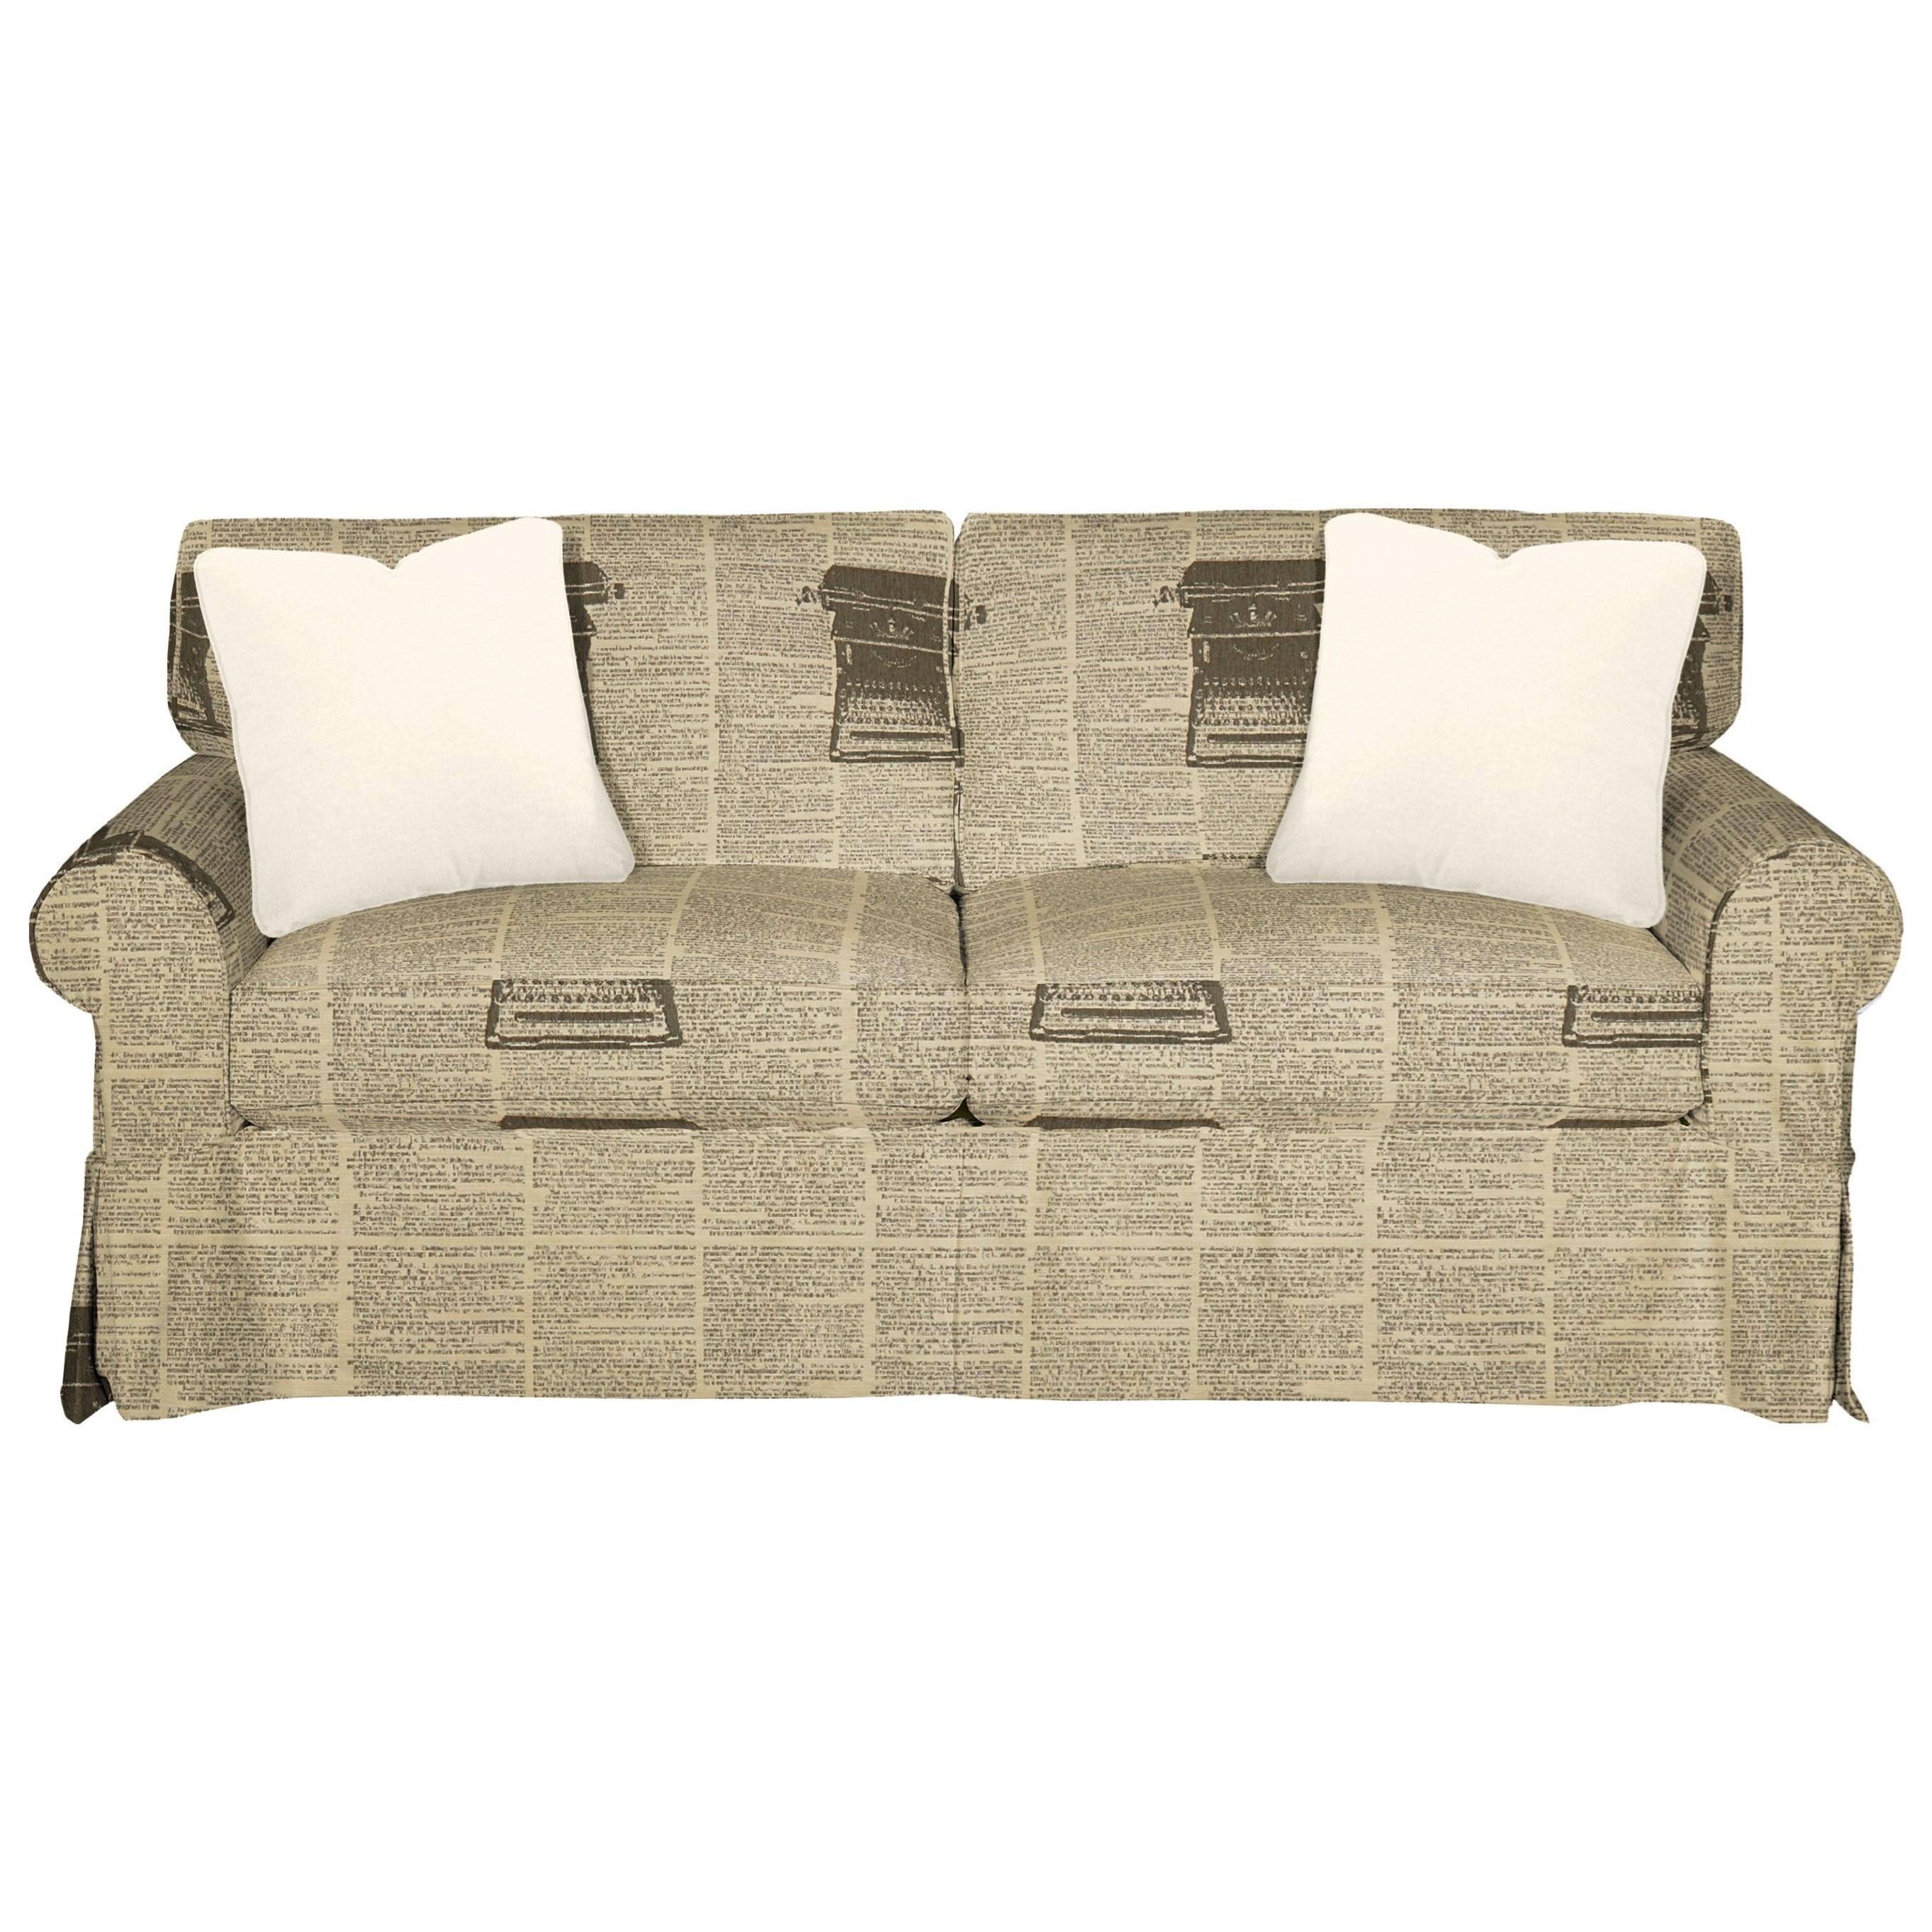 9228 Sleeper Sofa w/ Innerspring Mattress by Craftmaster at Baer's Furniture